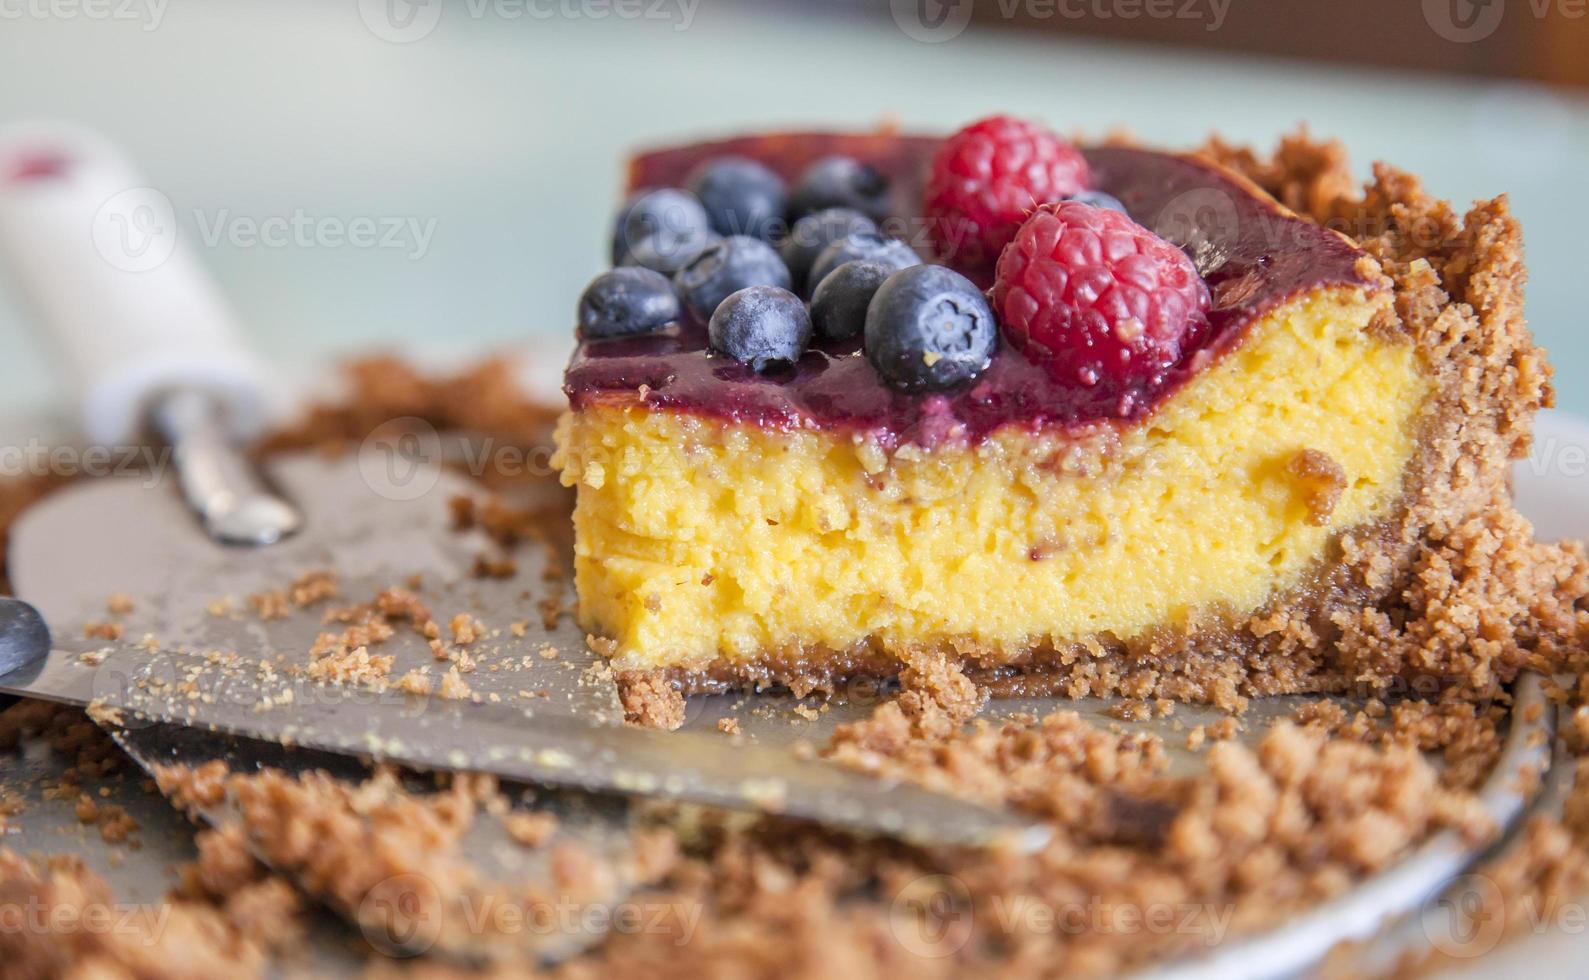 Cheesecake: last slice photo